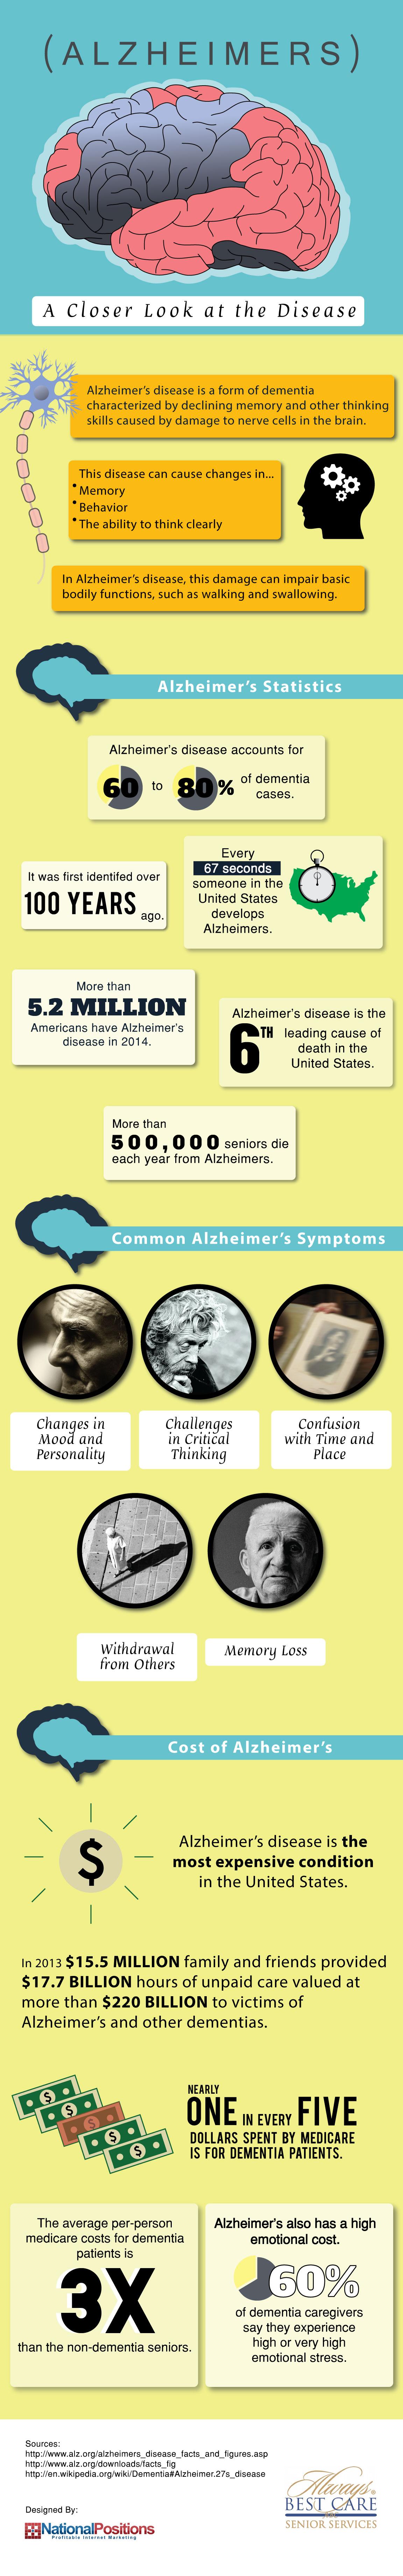 A Comprehensive Look at Alzheimer's: An Infographic